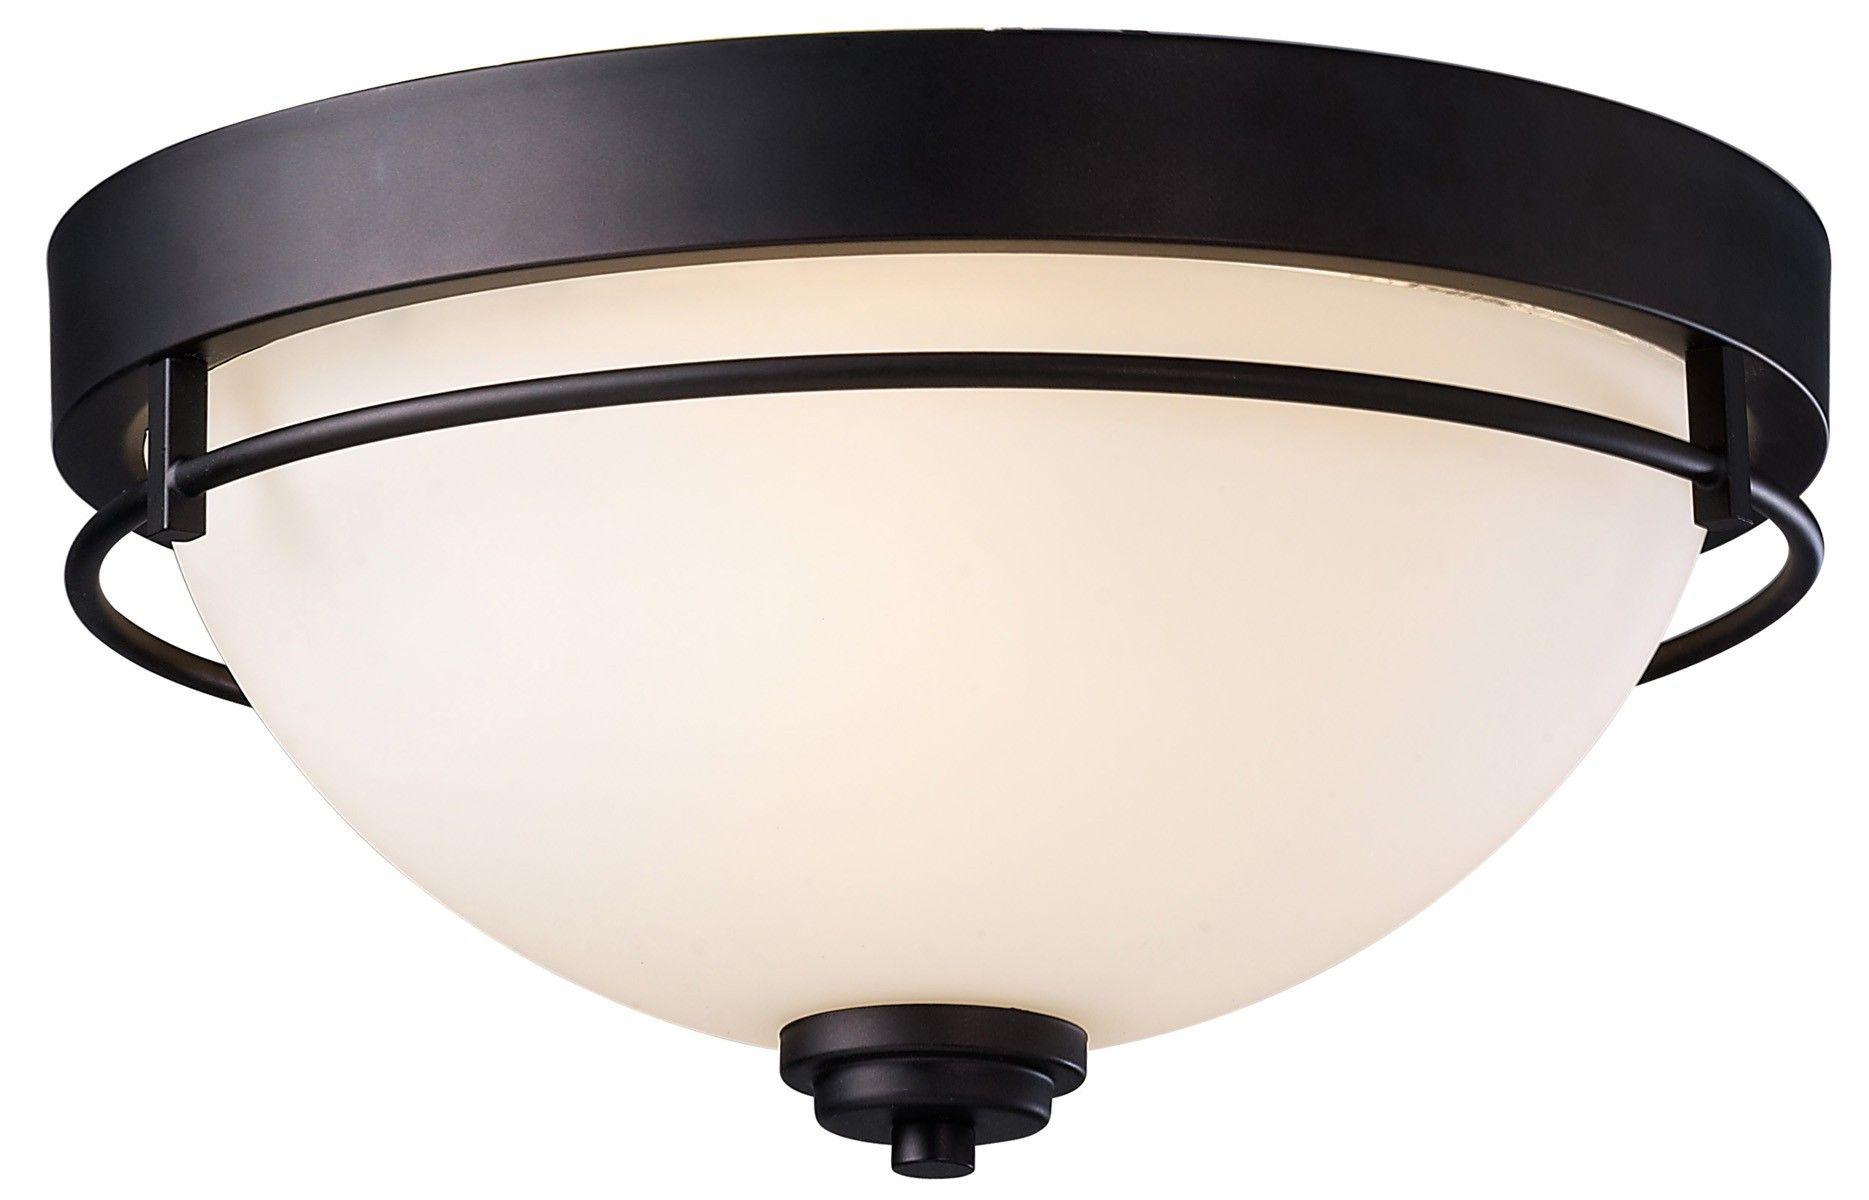 Canarm Ifm421a15orb Somerset 3 Light Flushmount Oil Rubbed Bronze Bedroom Light Fixtures Bronze Ceiling Lights Diy Light Fixtures